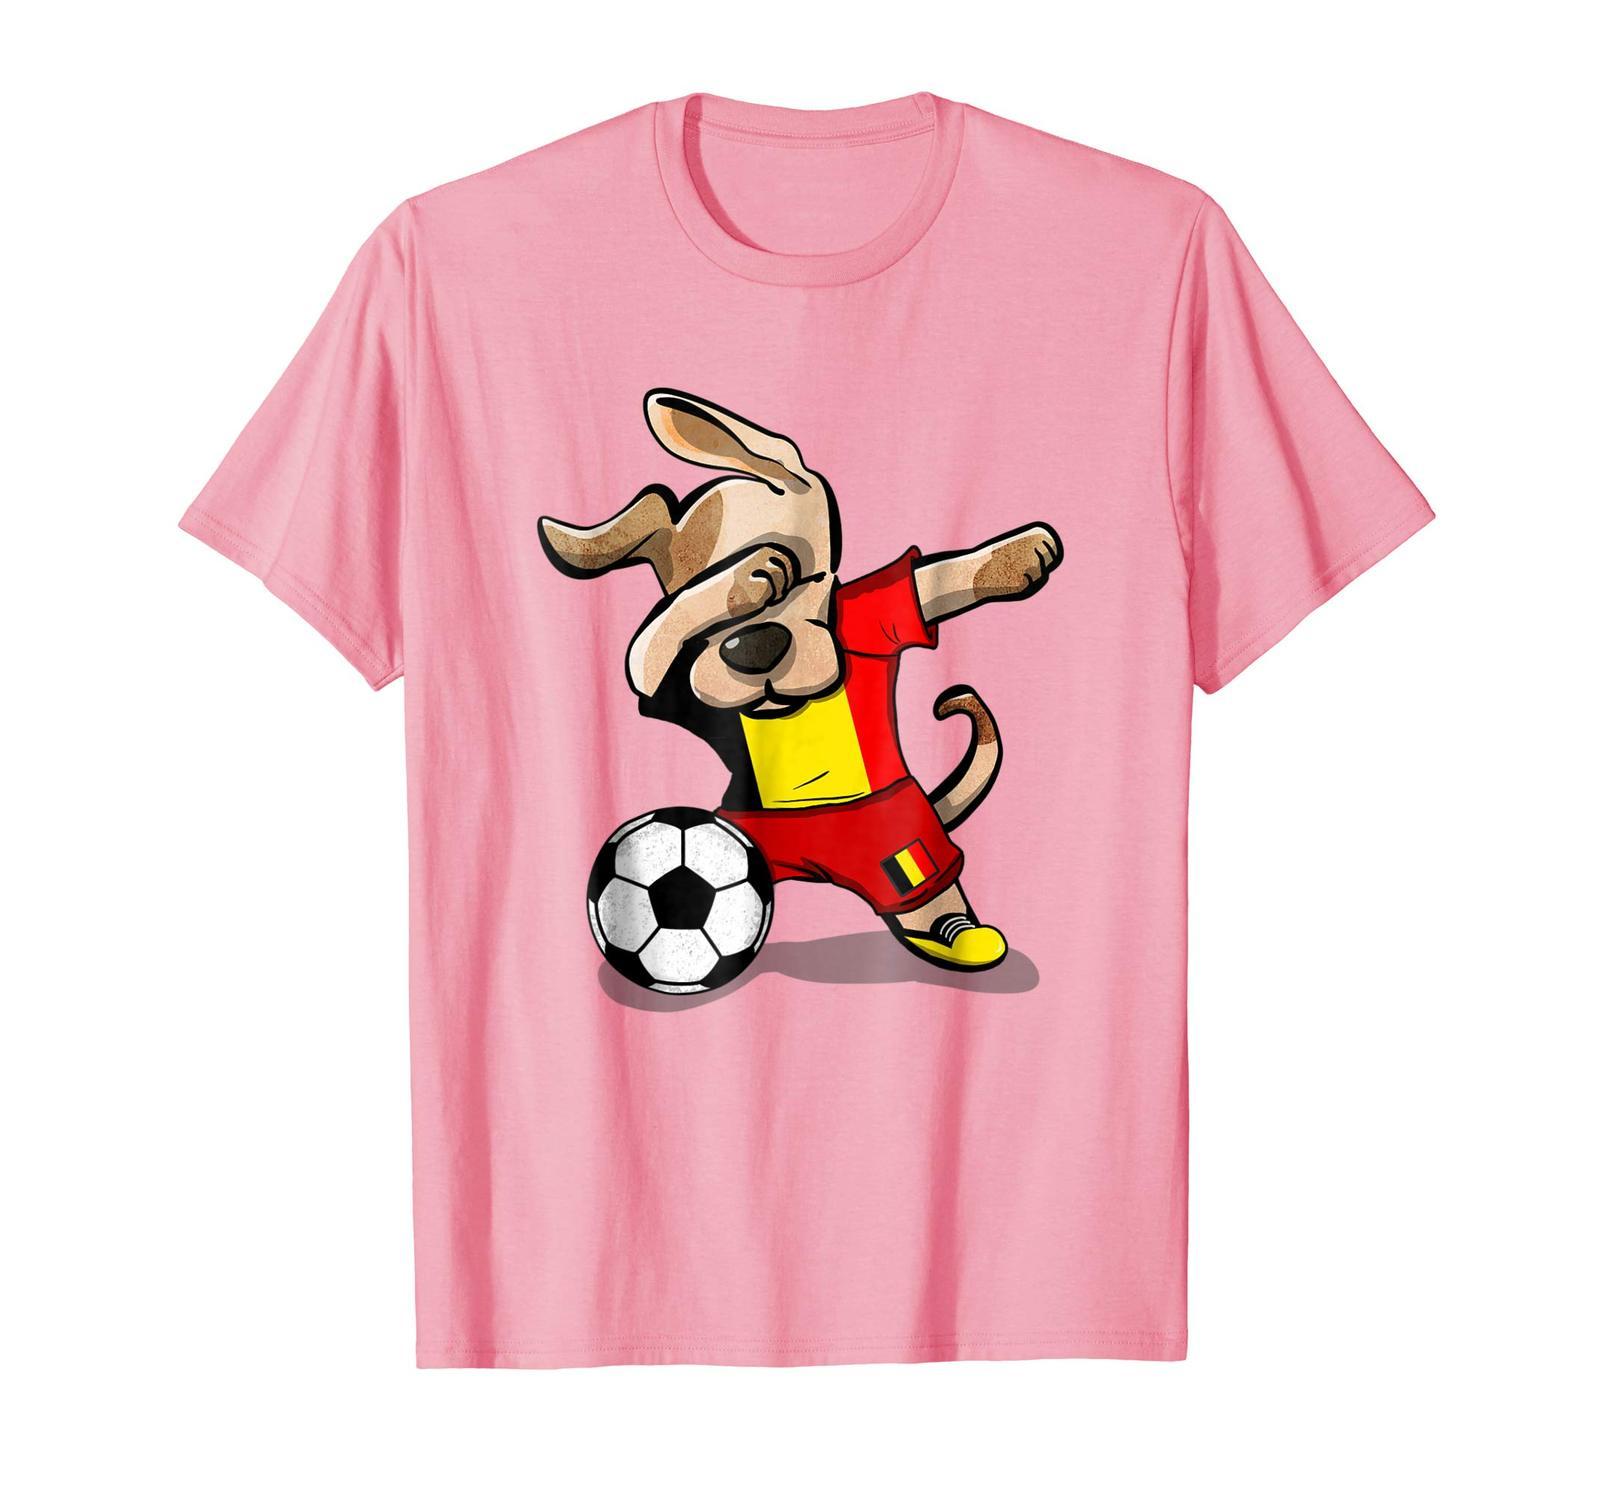 d7d4249b481 New Shirts - Dog Dabbing Soccer Belgium and 50 similar items